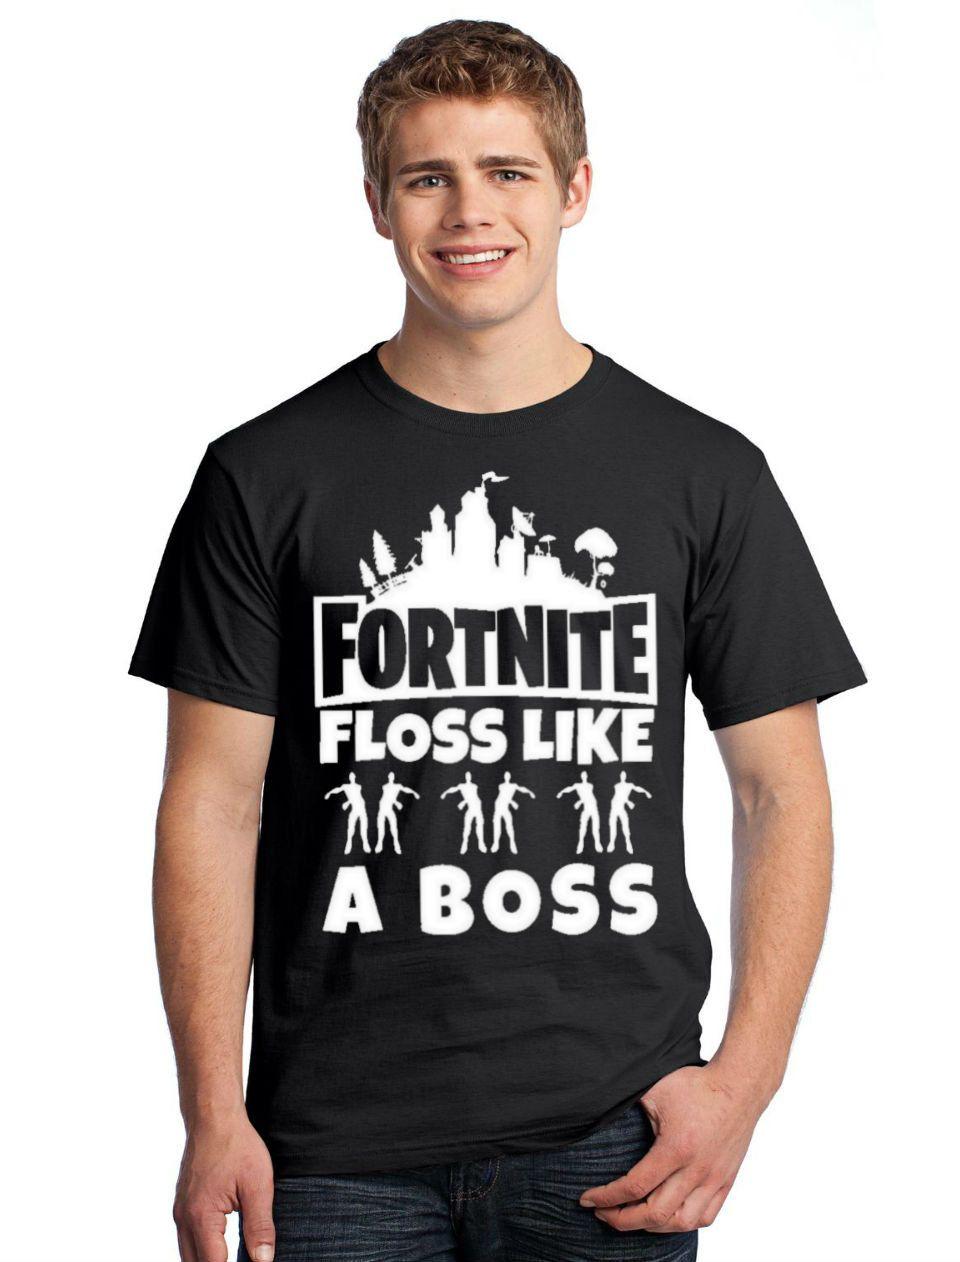 Fortnite Shirt Floss Like A Boss Shirt Fortnite Shirts By